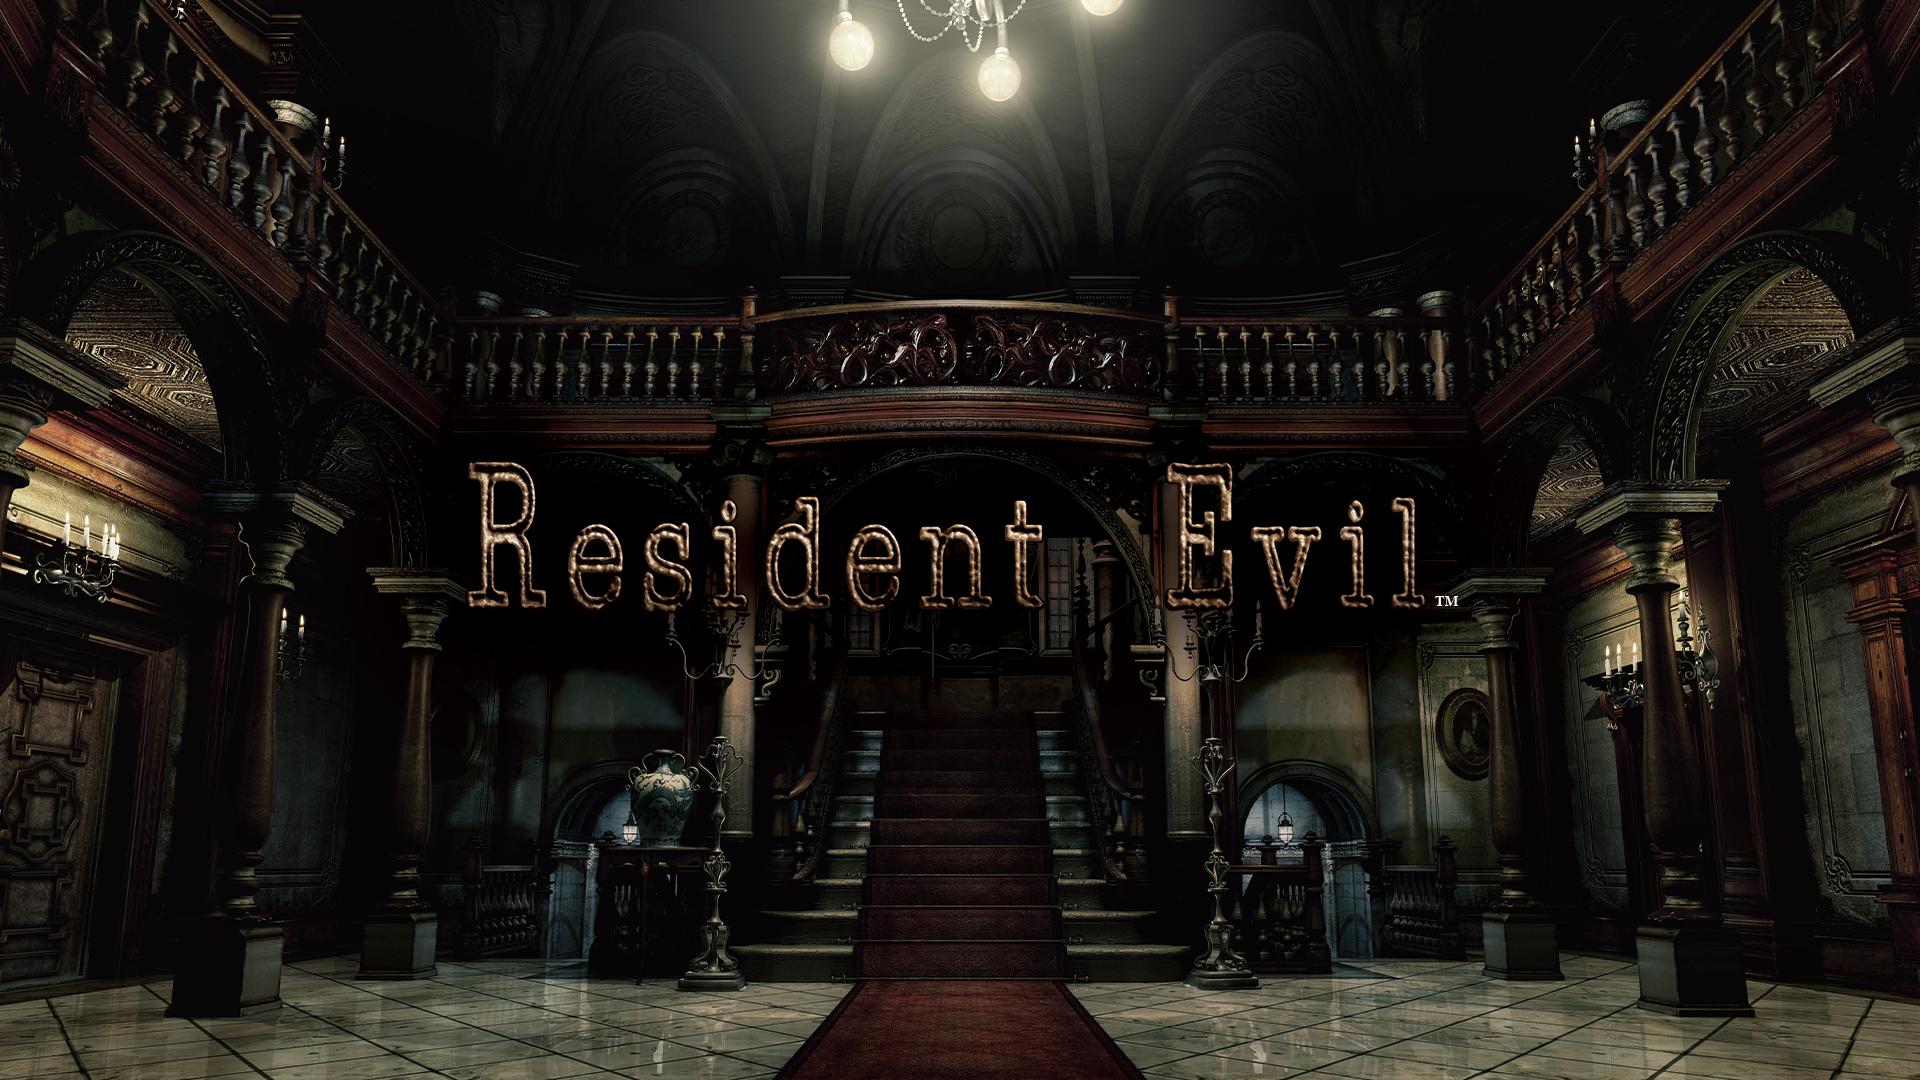 Nintendo Switch Digital Games: Resident Evil or Resident Evil 0 $12.89, Resident Evil 4, 5 or 6 $14.99, Velocity 2X $4.99, Snake Pass $5.99, Serial Cleaner $1.49 & More